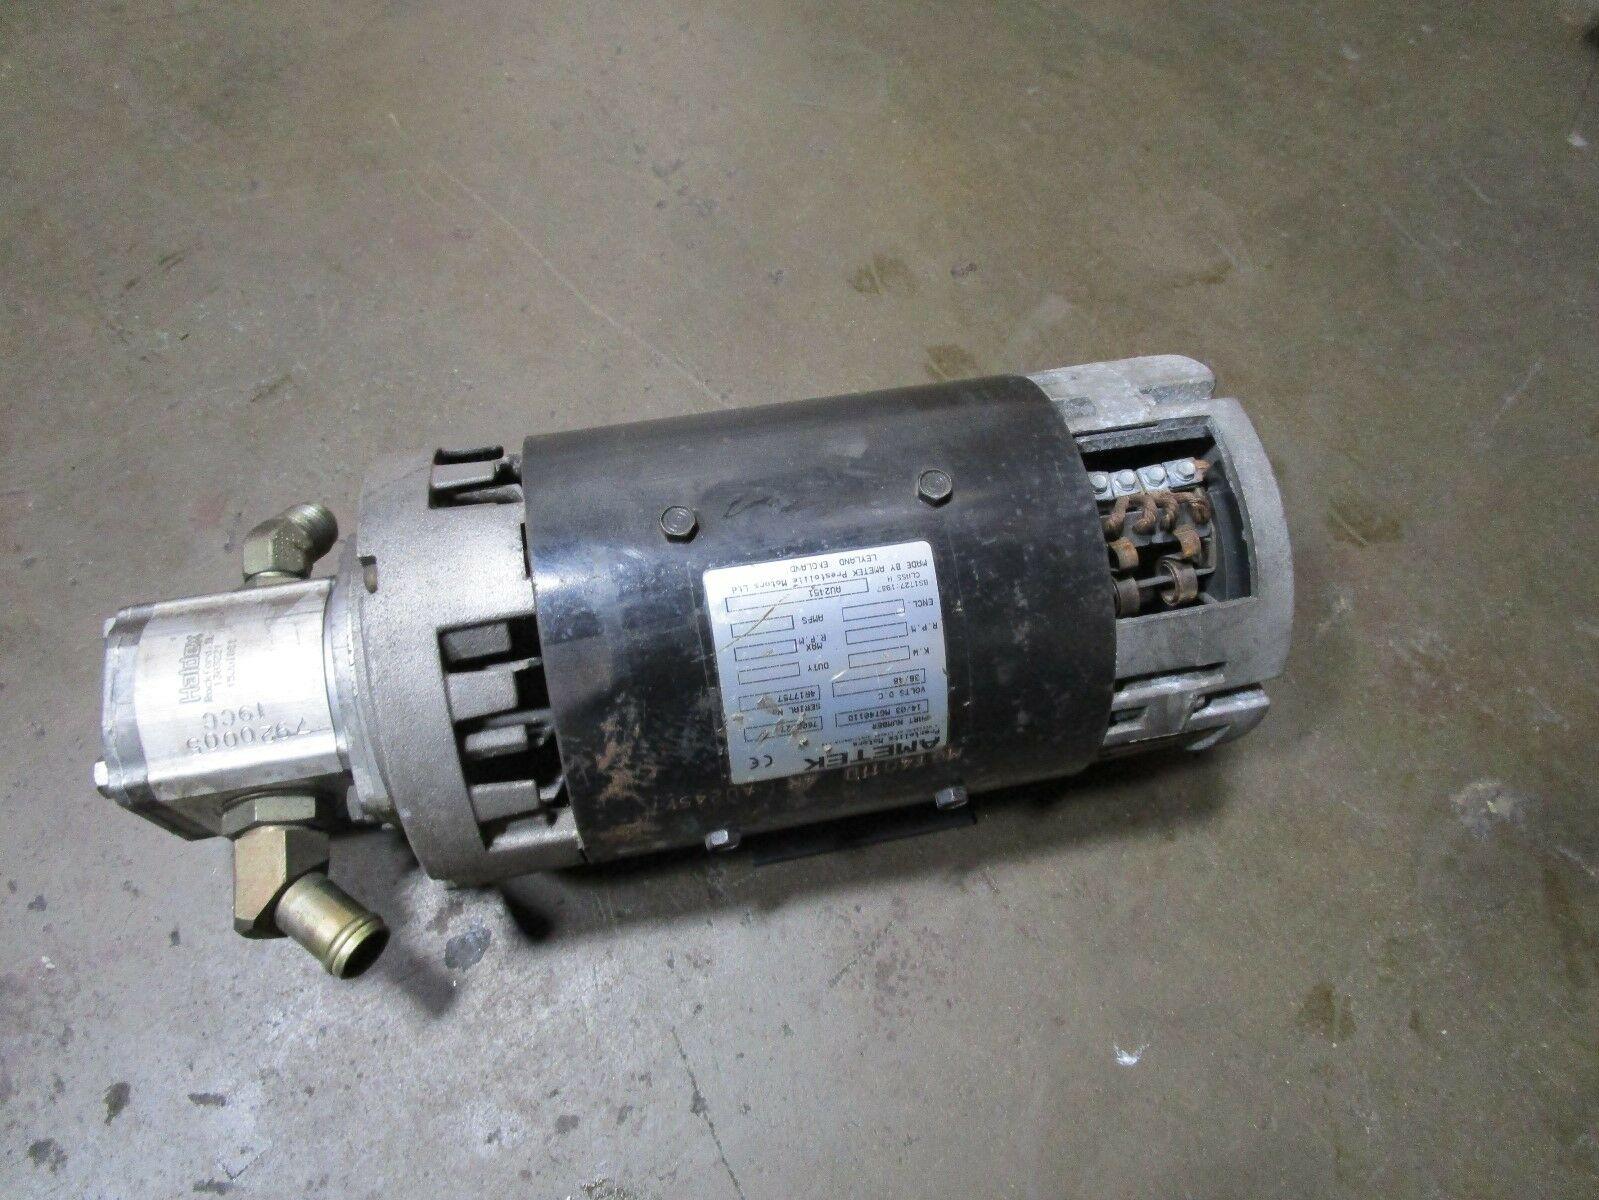 Toyota Fork Lift Hydraulic Motor and Pump Ametek Prestolite MGT4011D